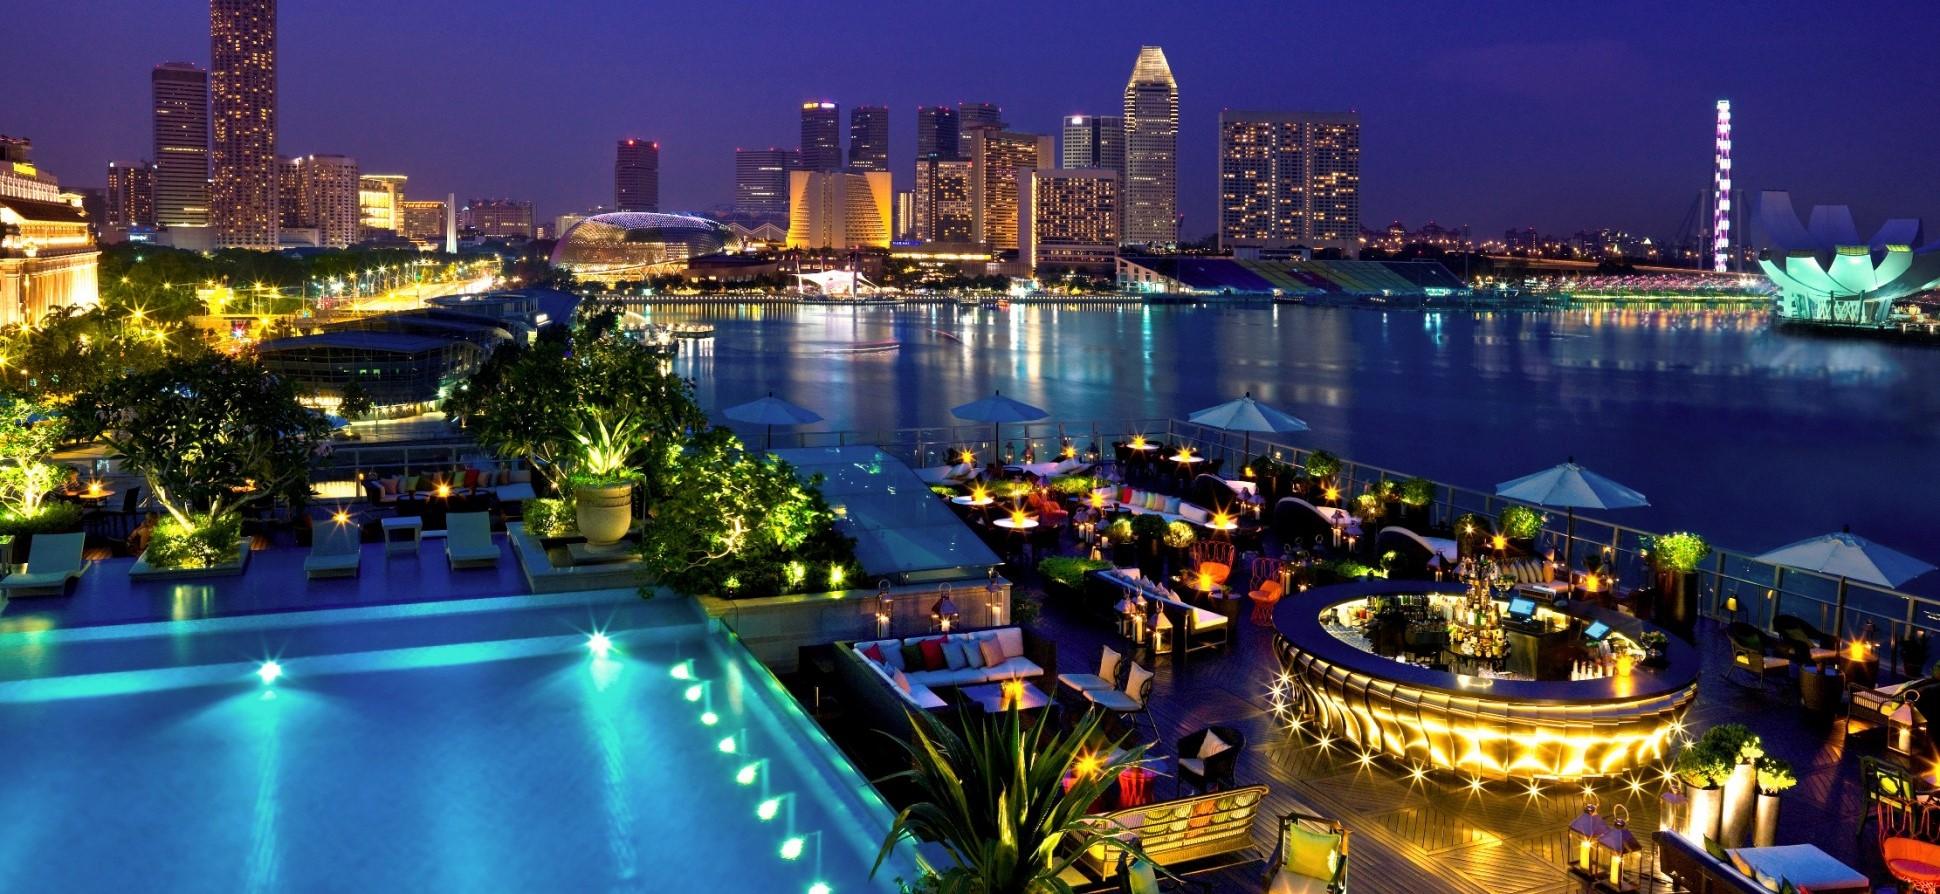 Lantern-III-The-Fullerton-Bay-Hotel-Singapore - Crop